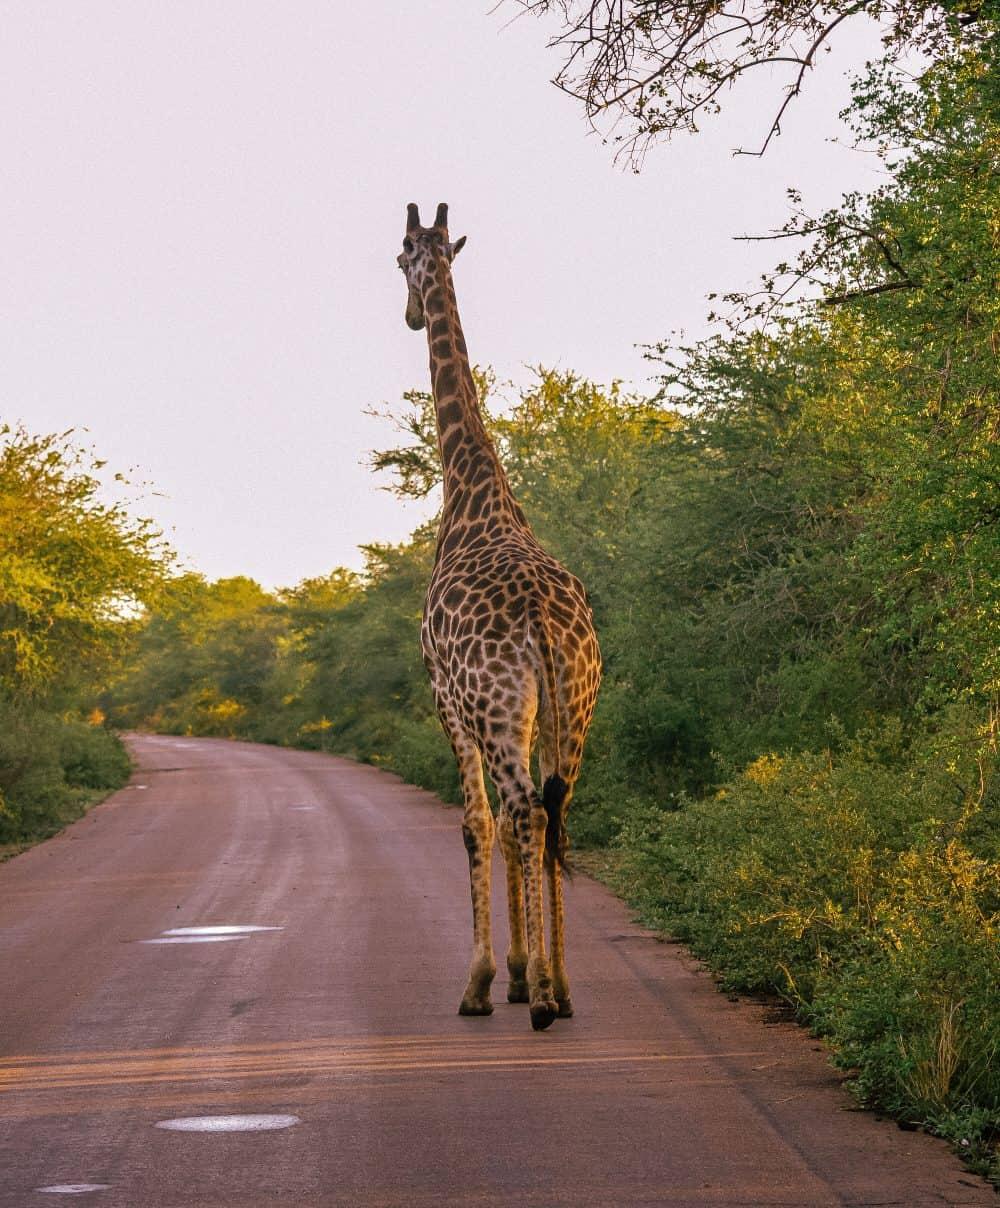 Giraffes at Chobe National Park, Botswana